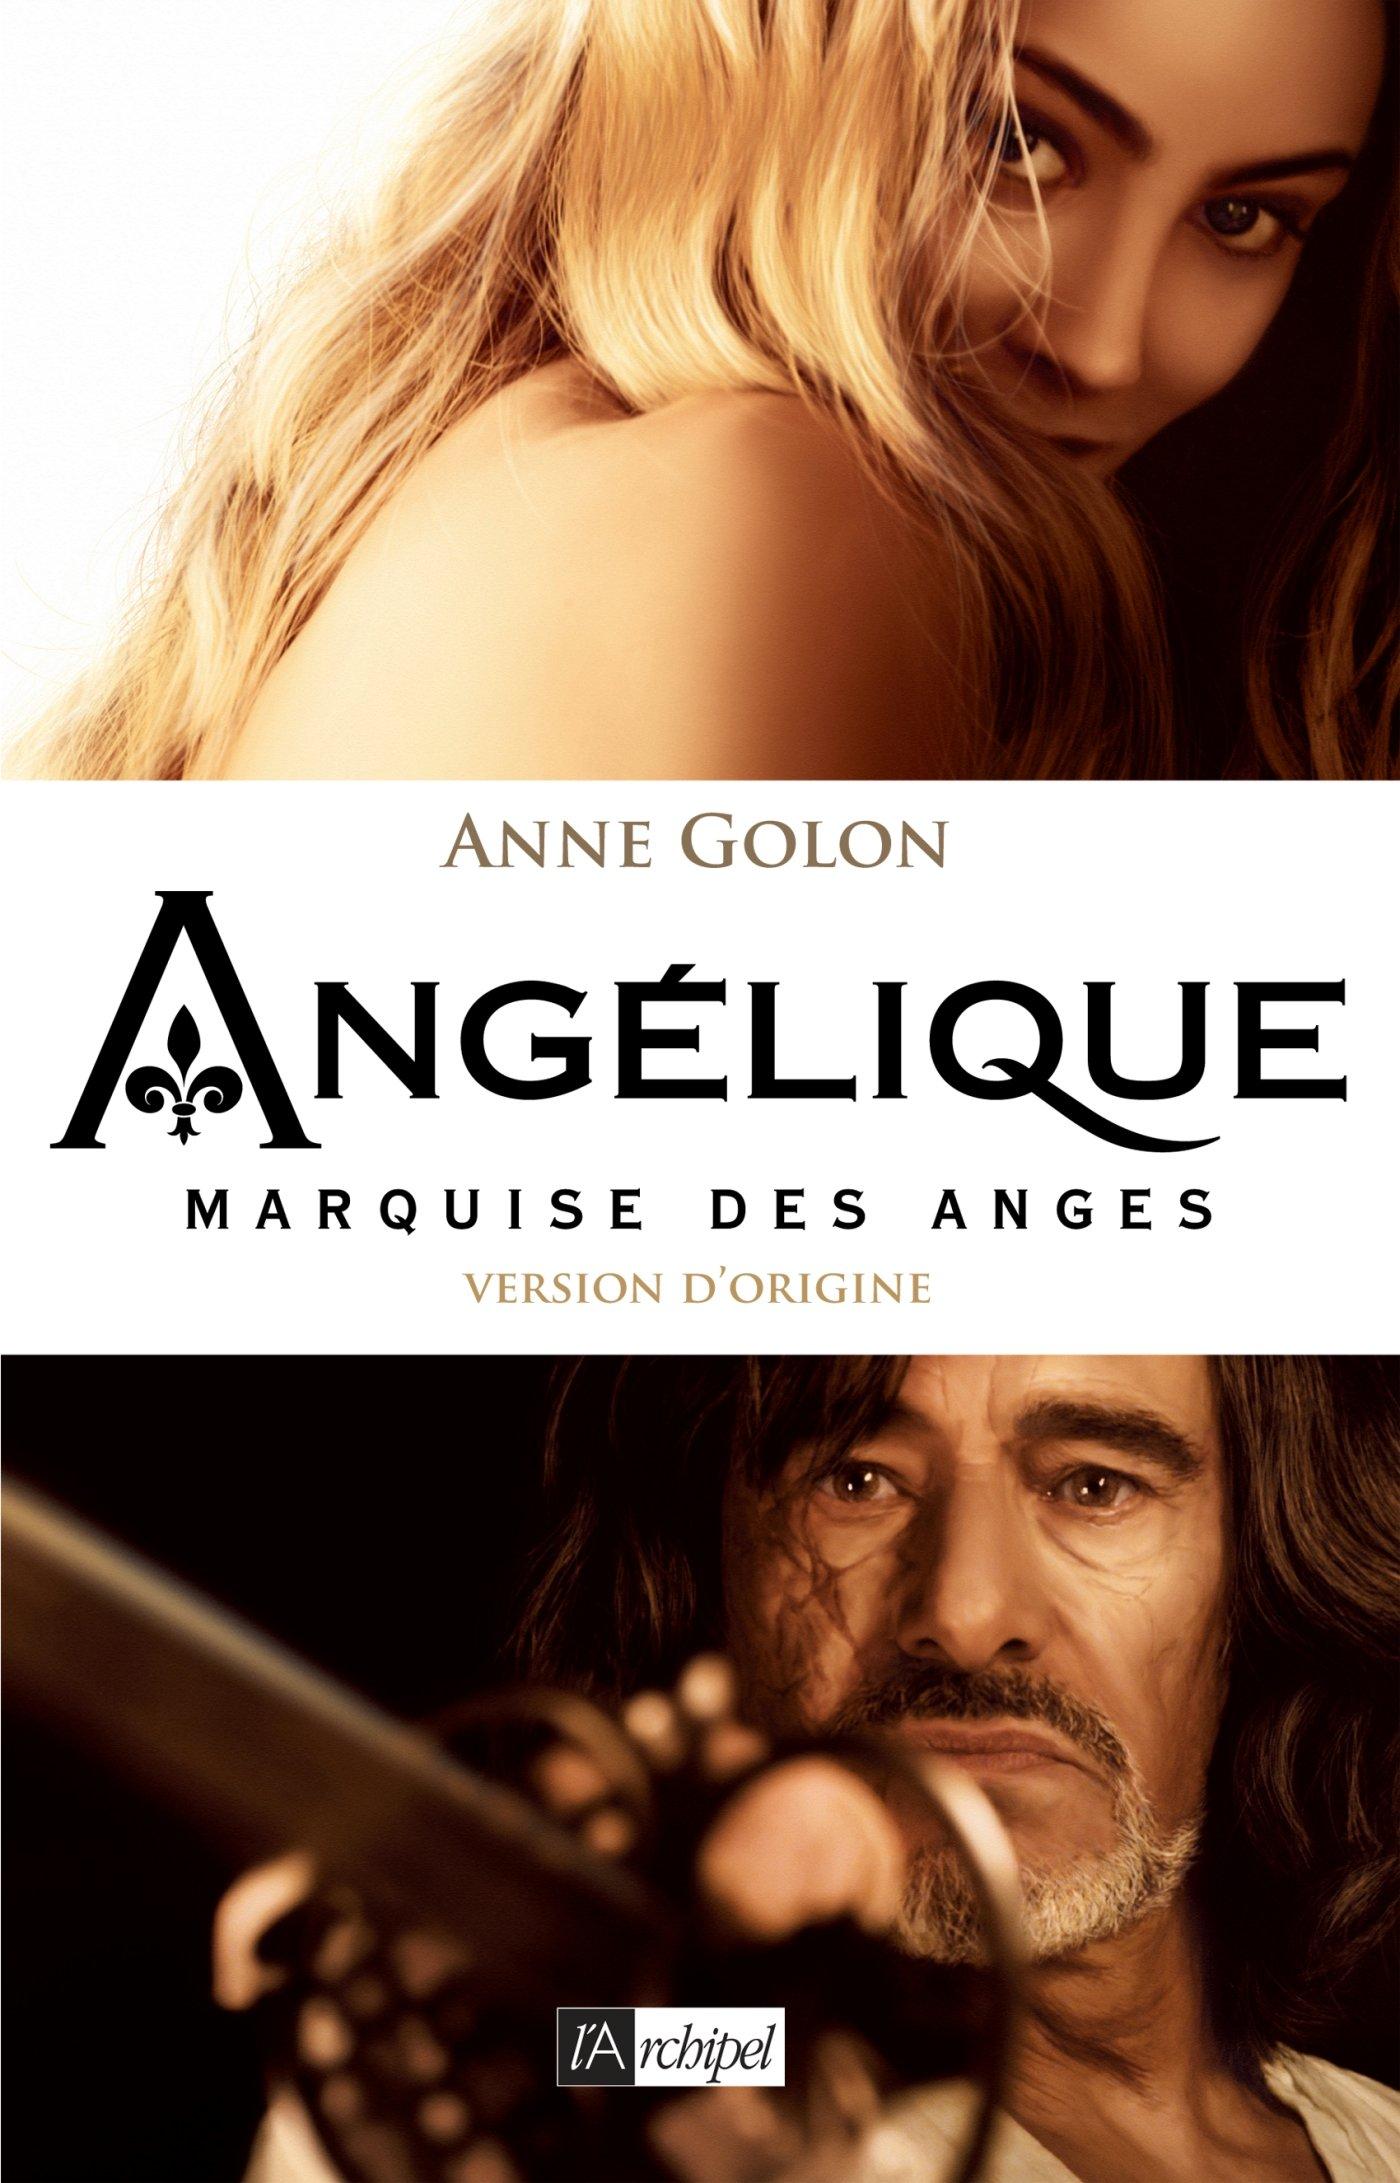 http://angelique.cz/obaly/fr8_book1.jpg